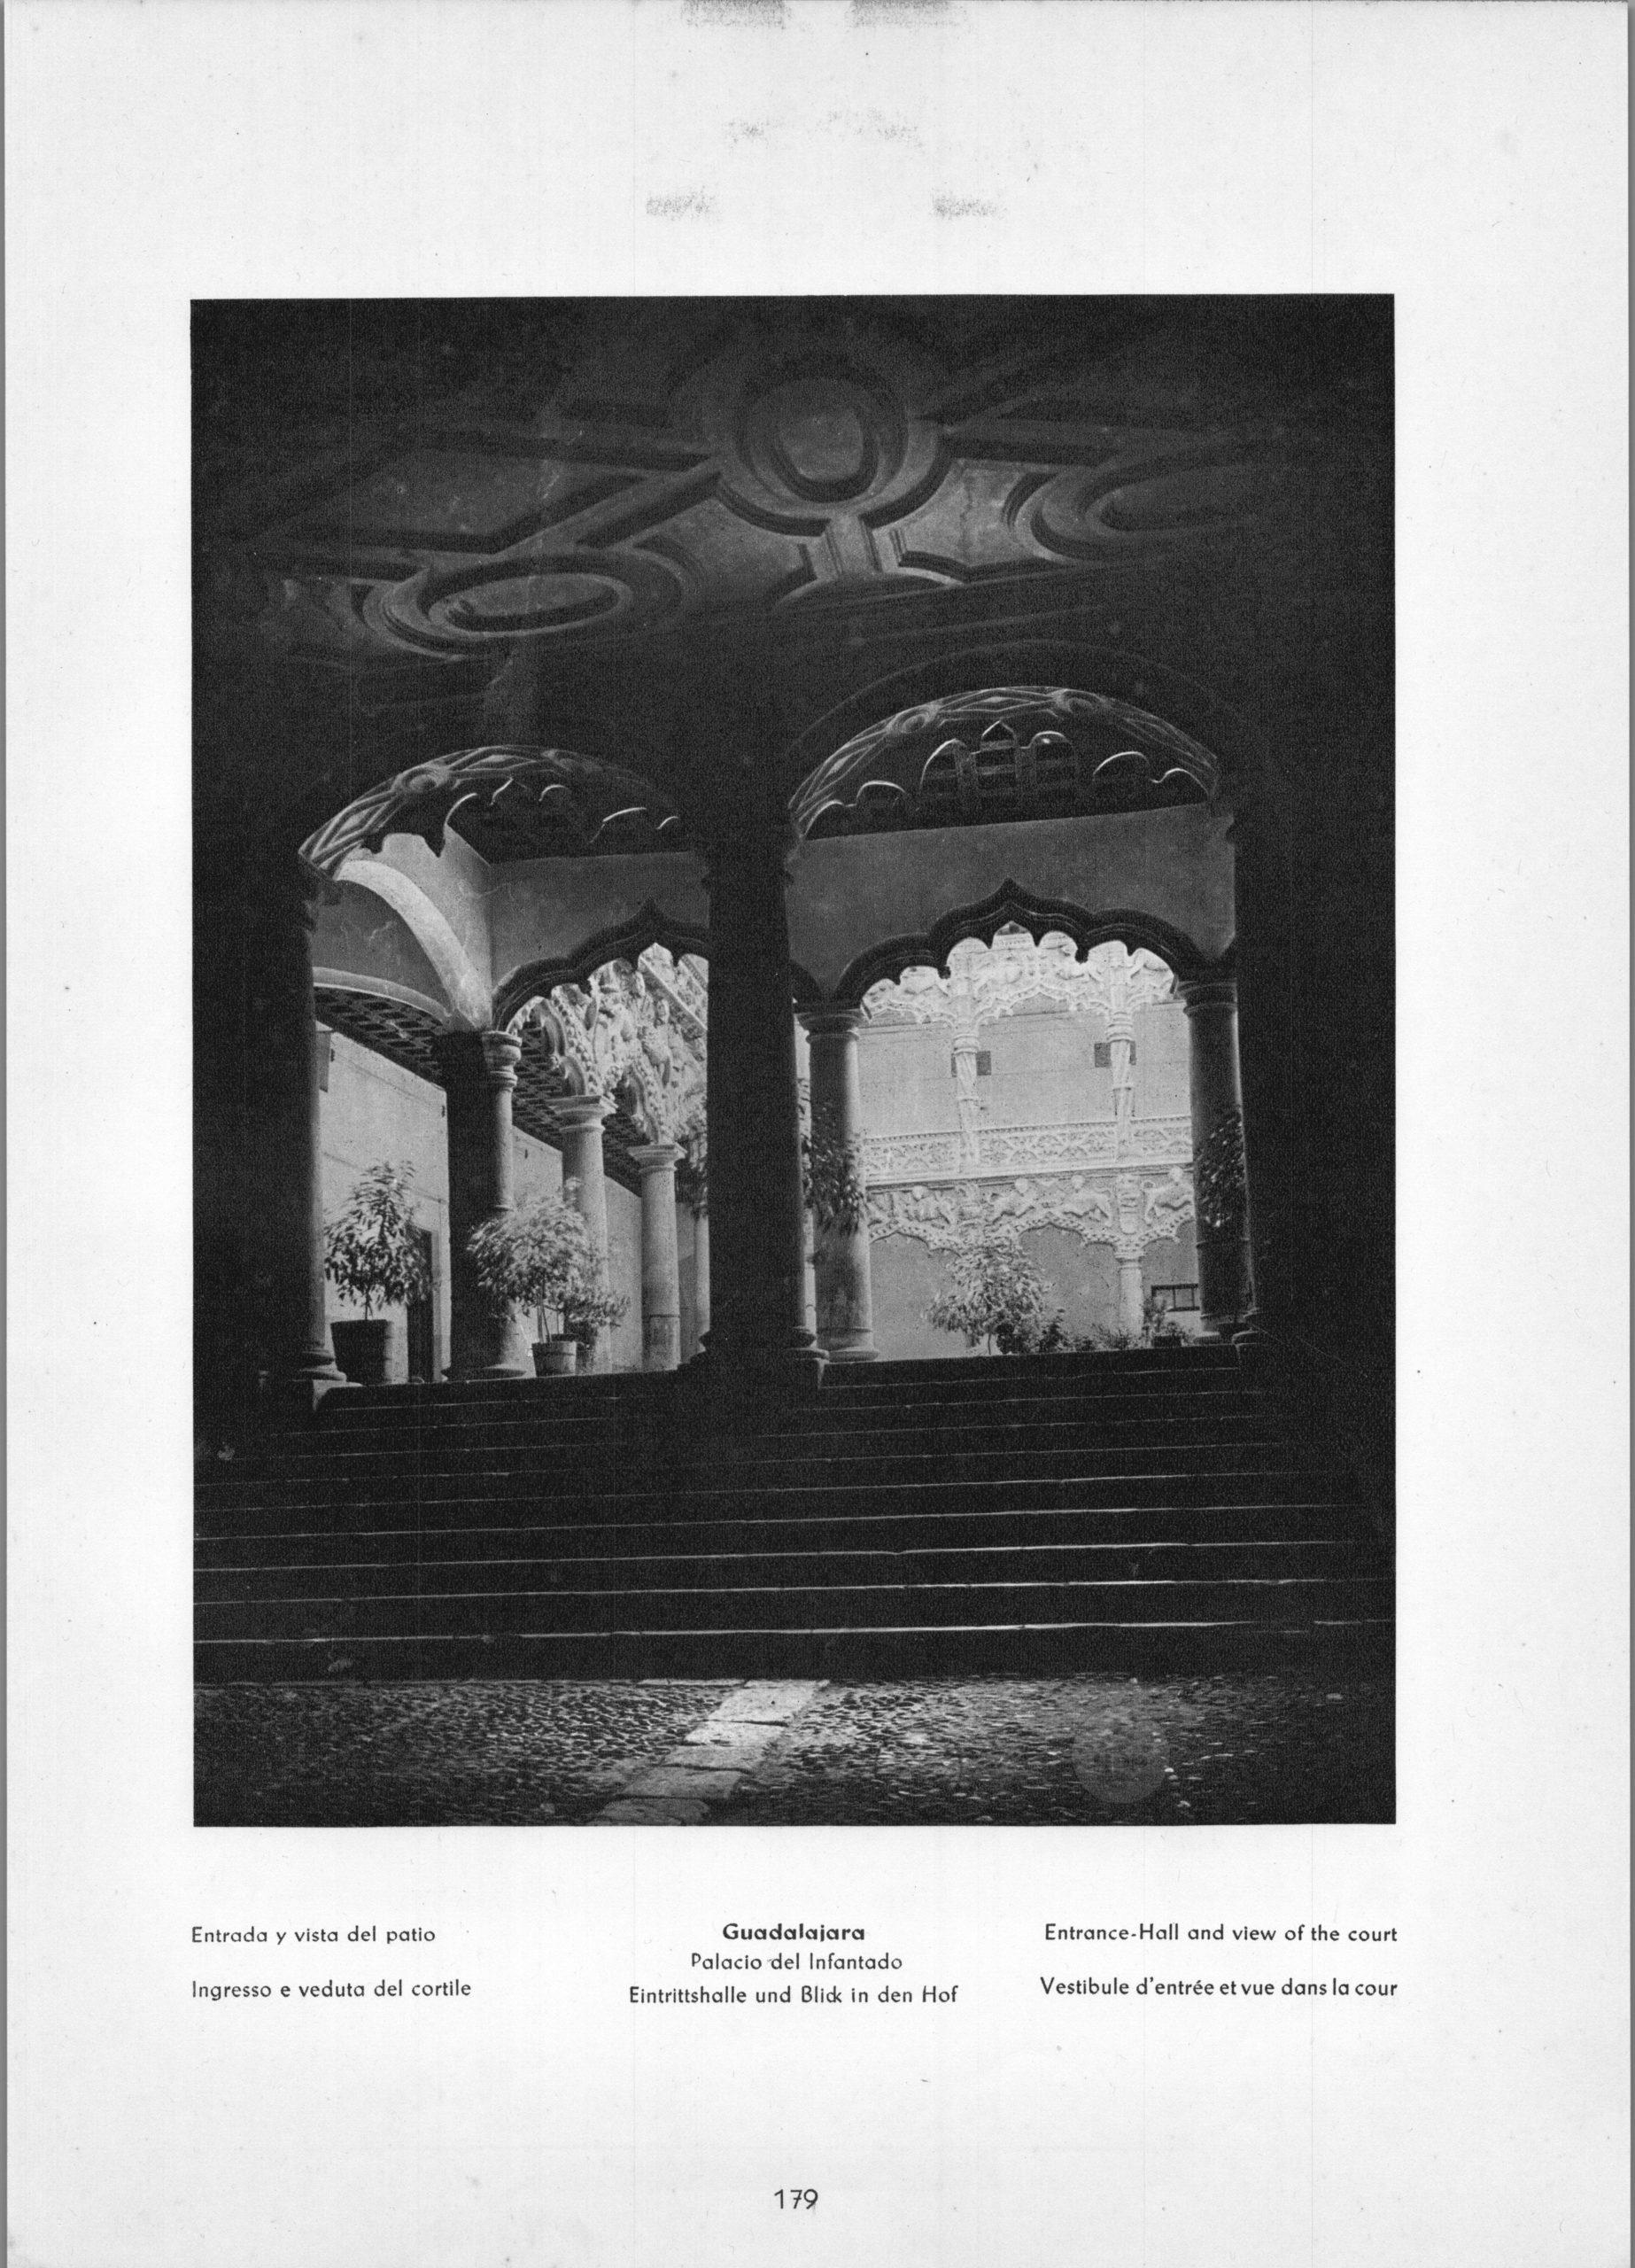 Guadalajara Palacio del Infantado - Entrance-Hall and view of the court